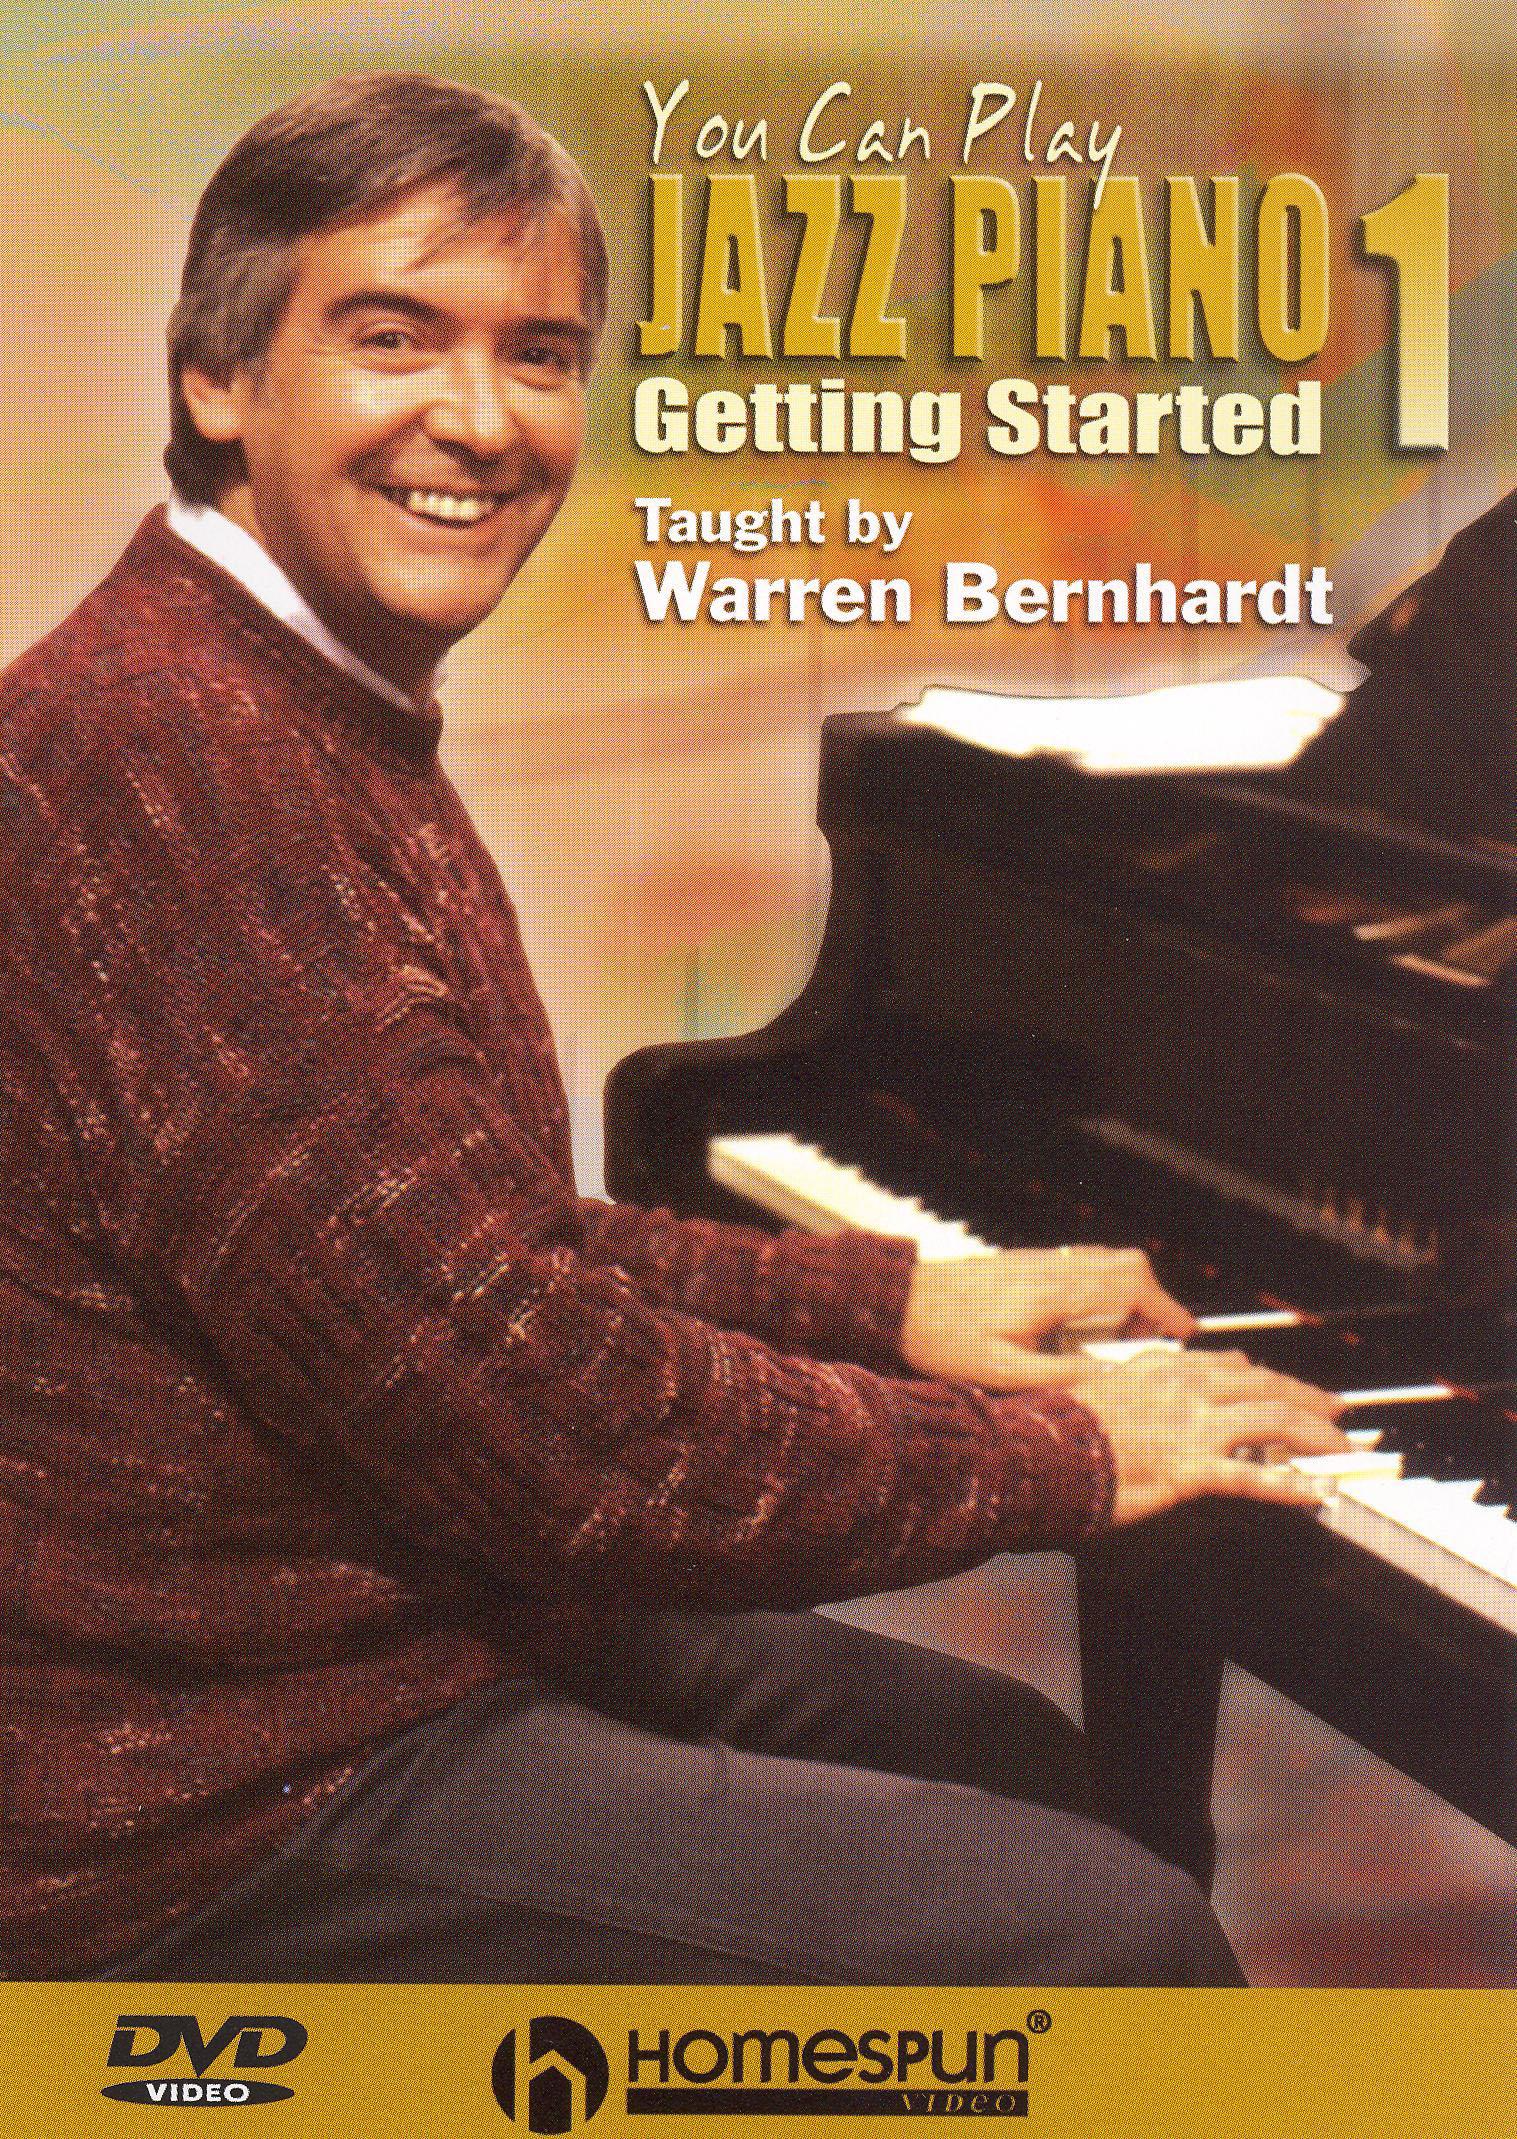 Warren Bernhardt: You Can Play Jazz Piano